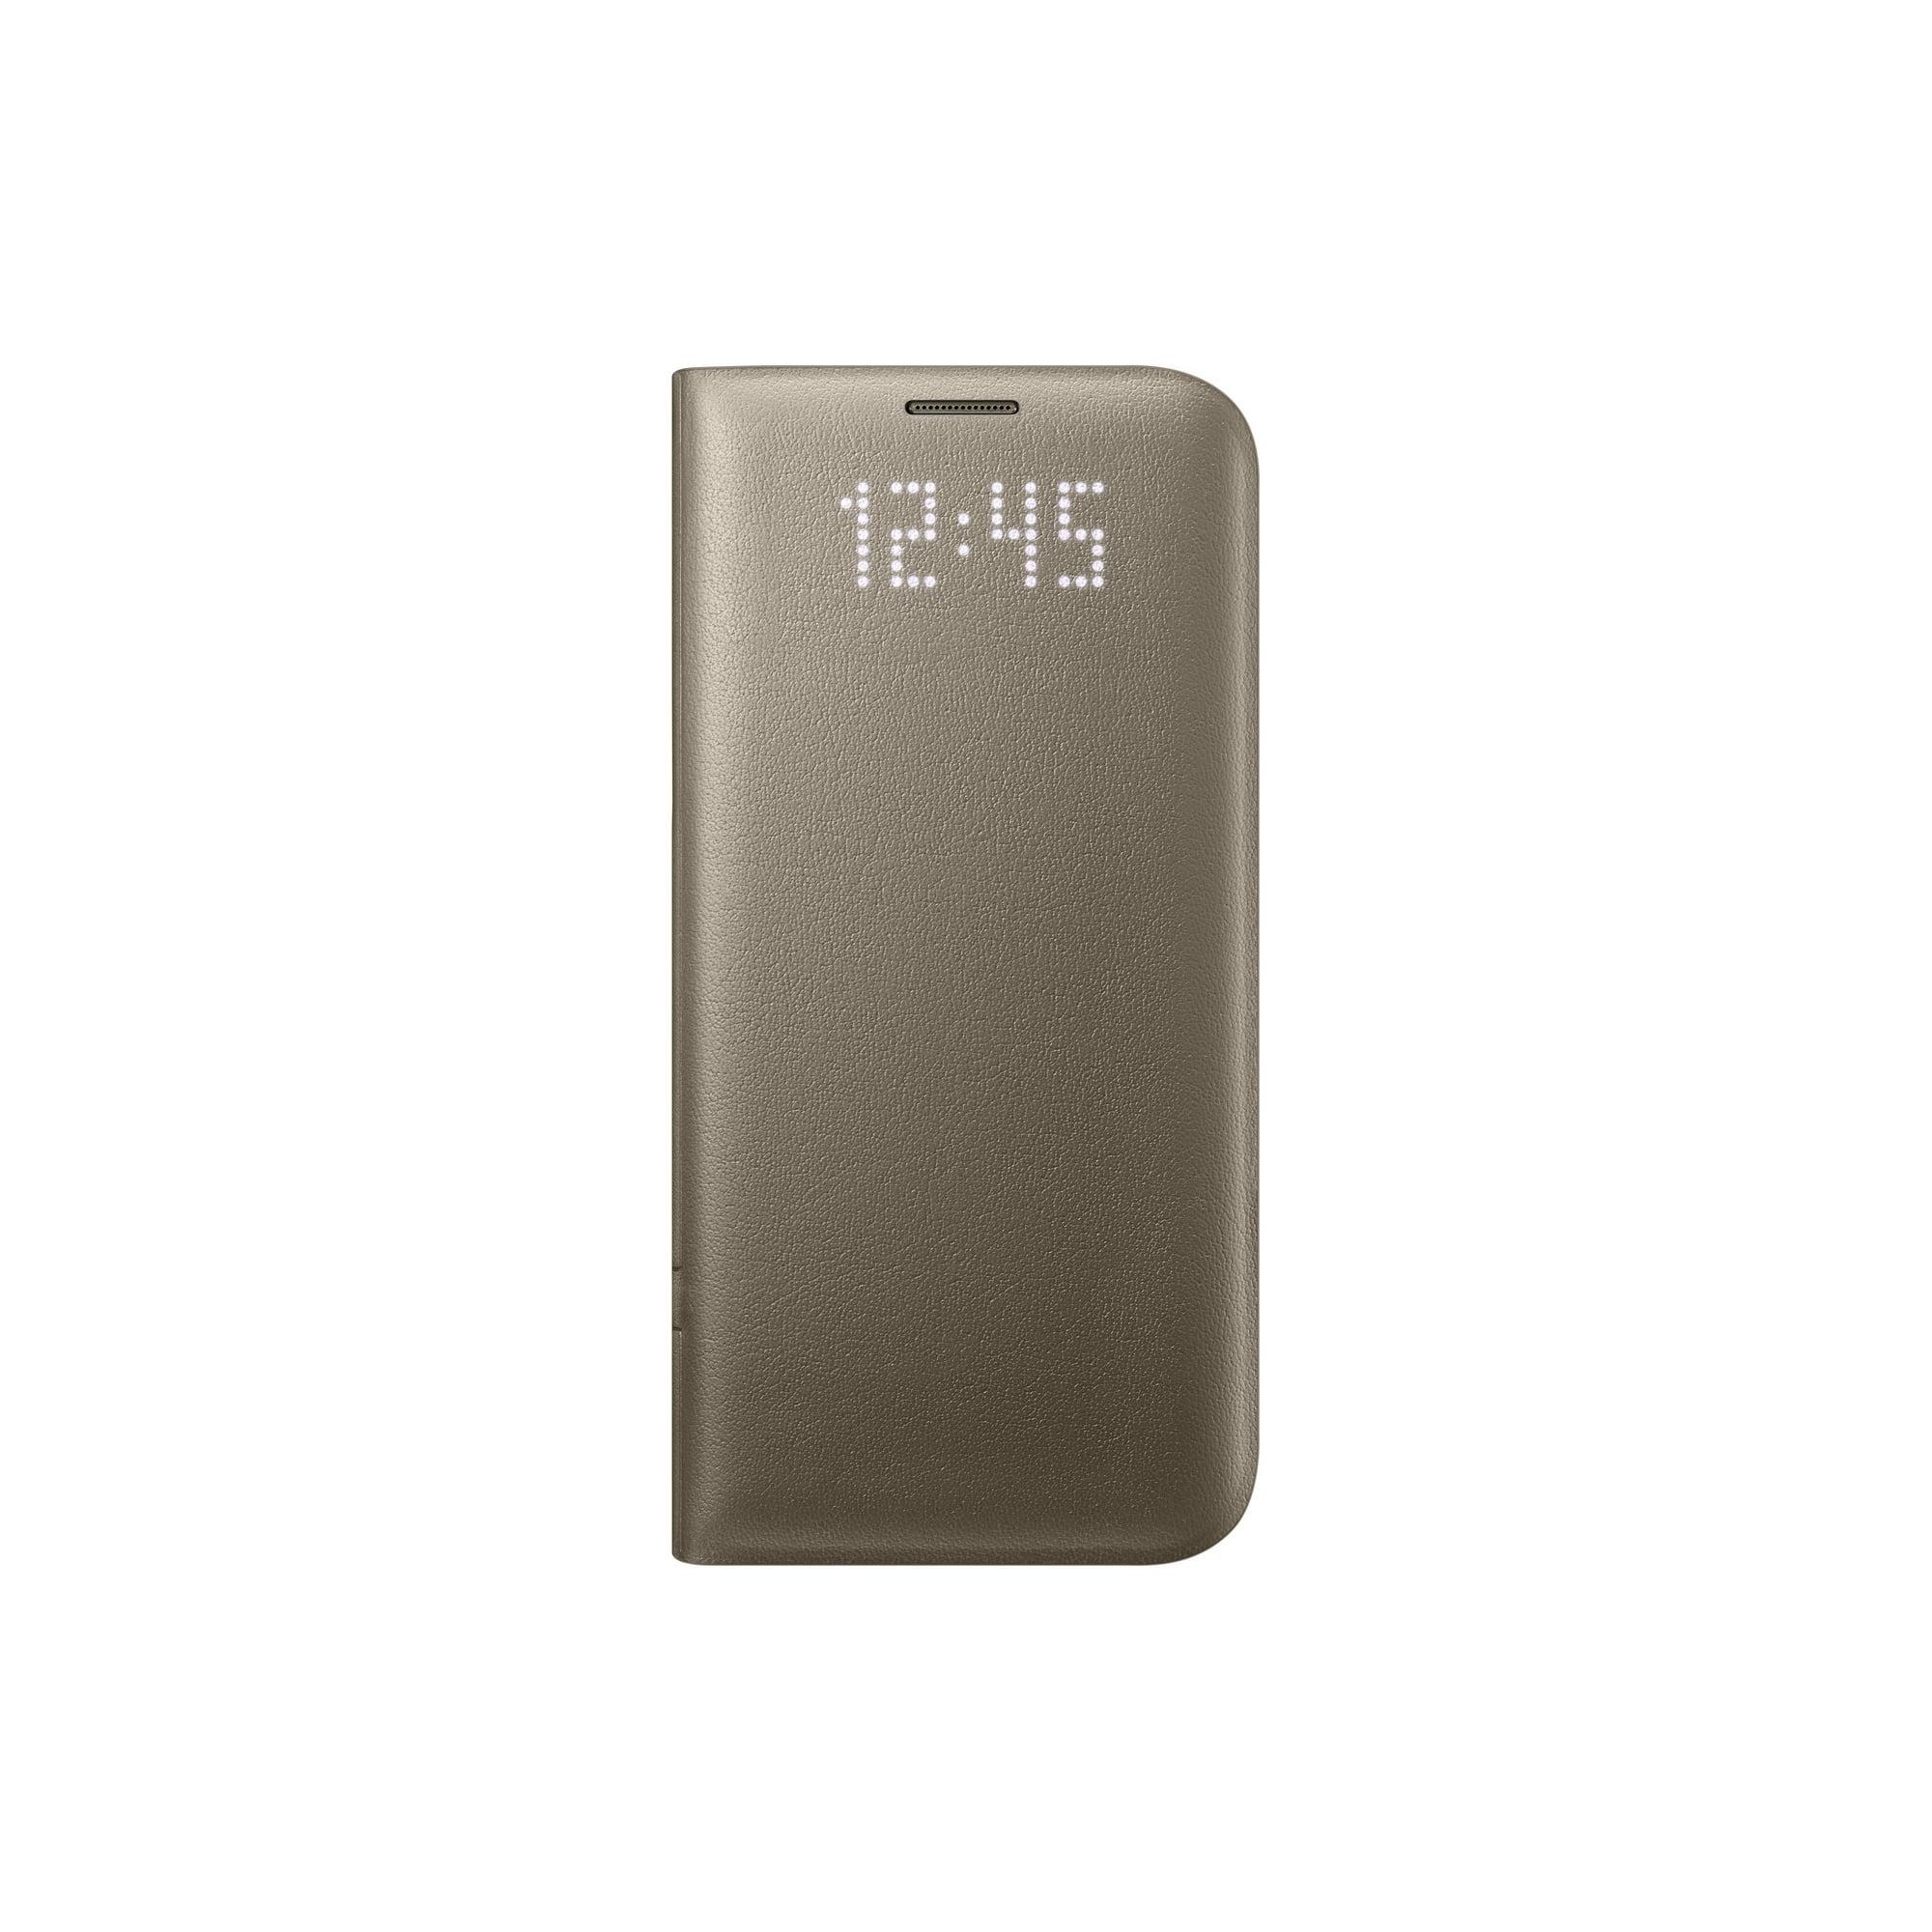 2f27e3c09e2 Samsung Galaxy S7 Edge OEM Gold LED View Cover - EF-NG935PFEGCA | Walmart  Canada